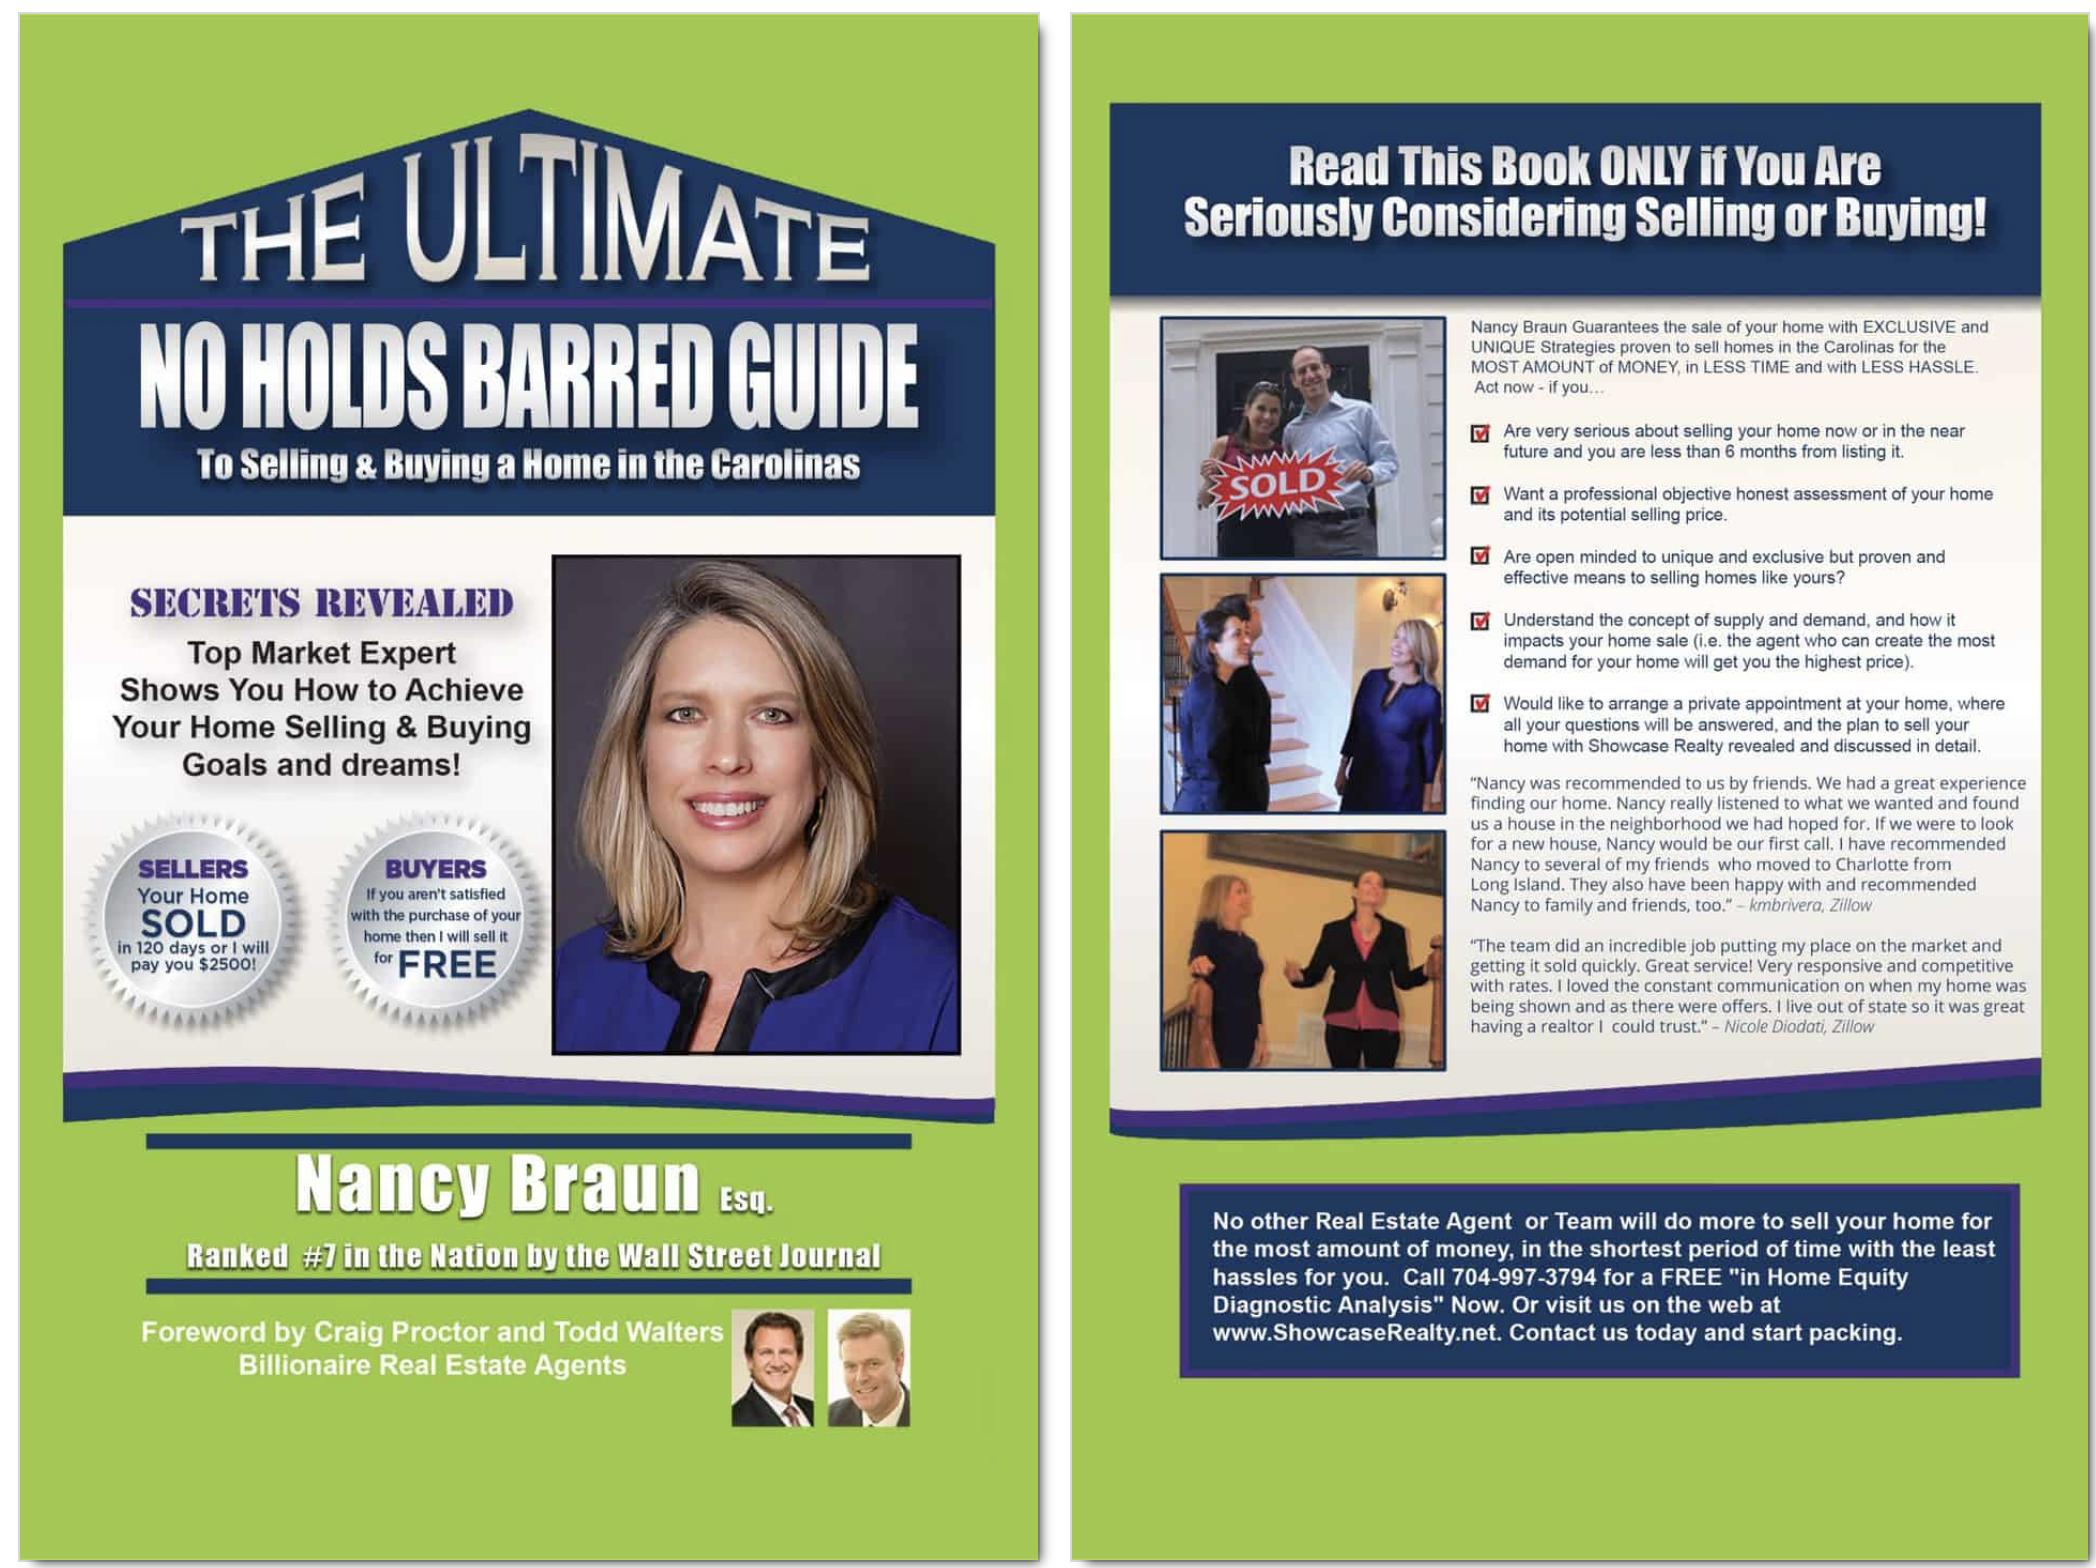 Nancy Braun Book Cover.png